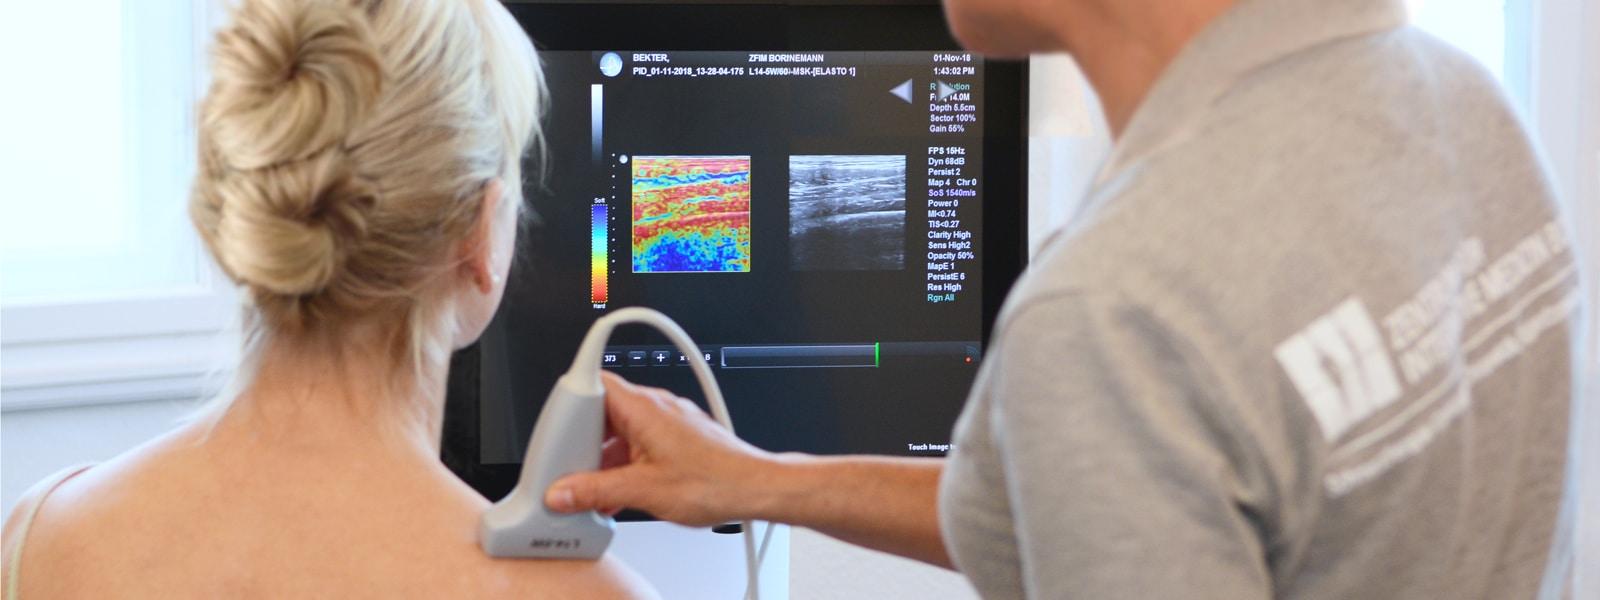 Elastografie-Diagnose, Praxis Borneman, Lübeck